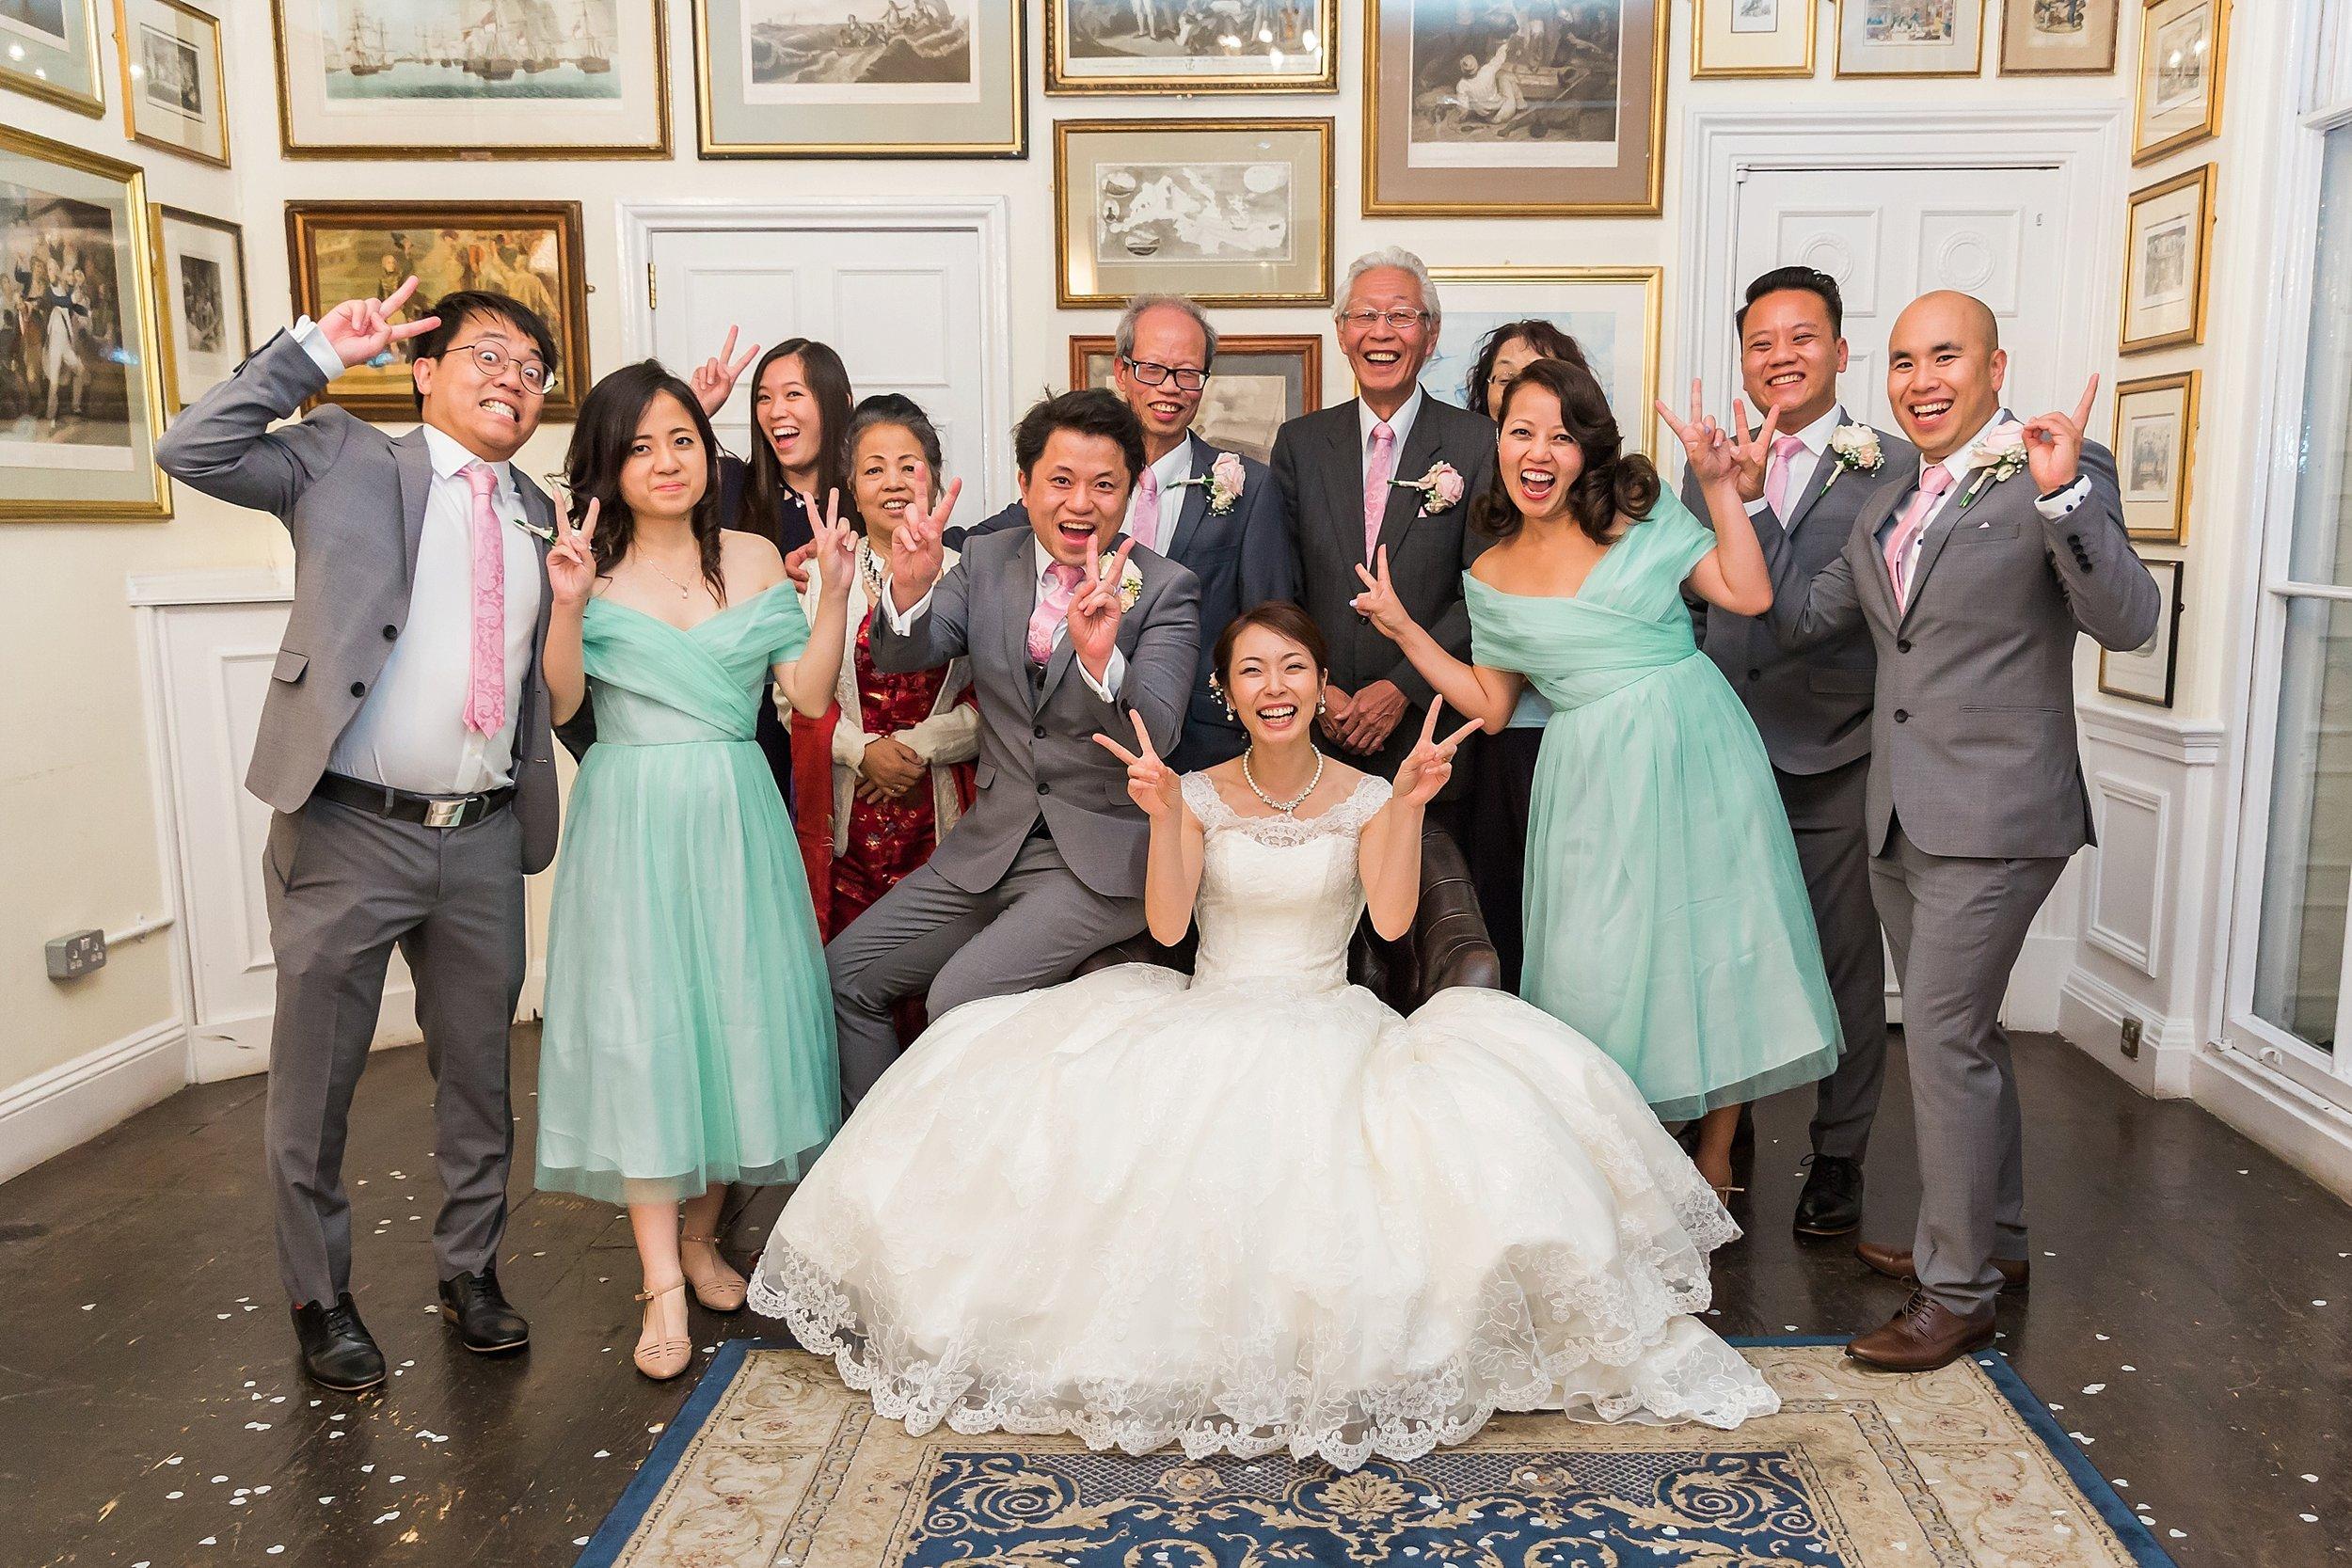 fun-wedding-photo.jpg